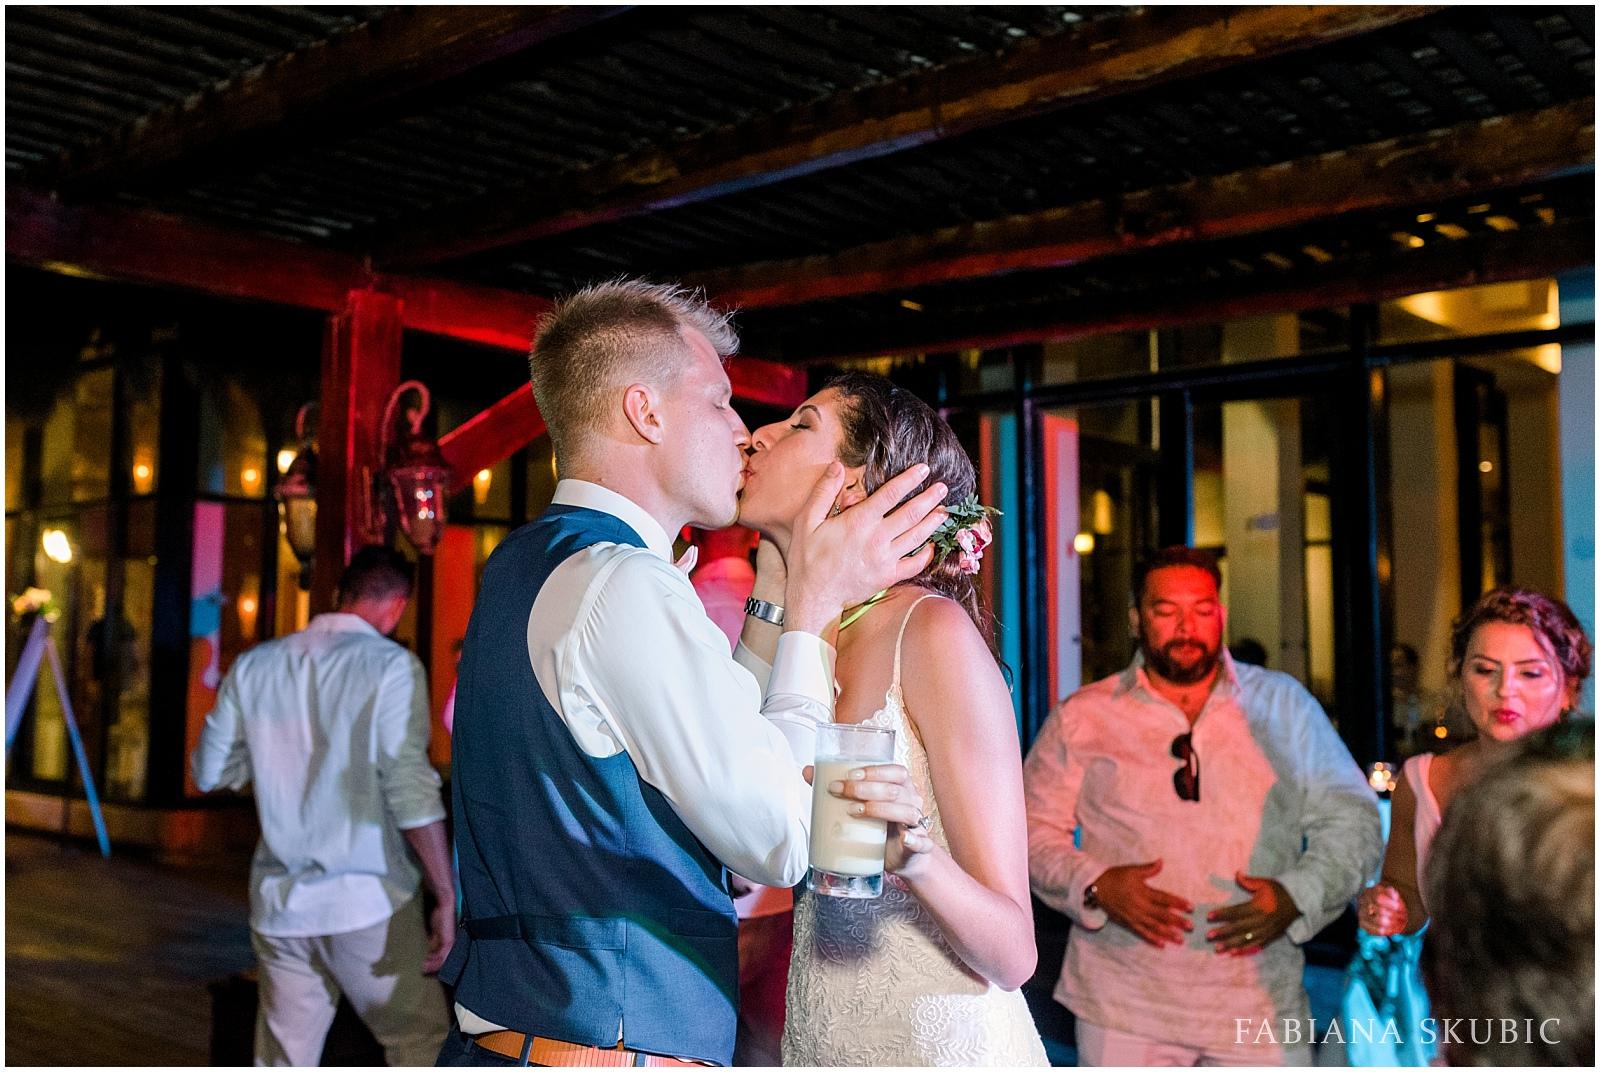 TJ_Now_Sapphire_Riviera_Cancun_Mexico_Wedding_Photos_0284.jpg